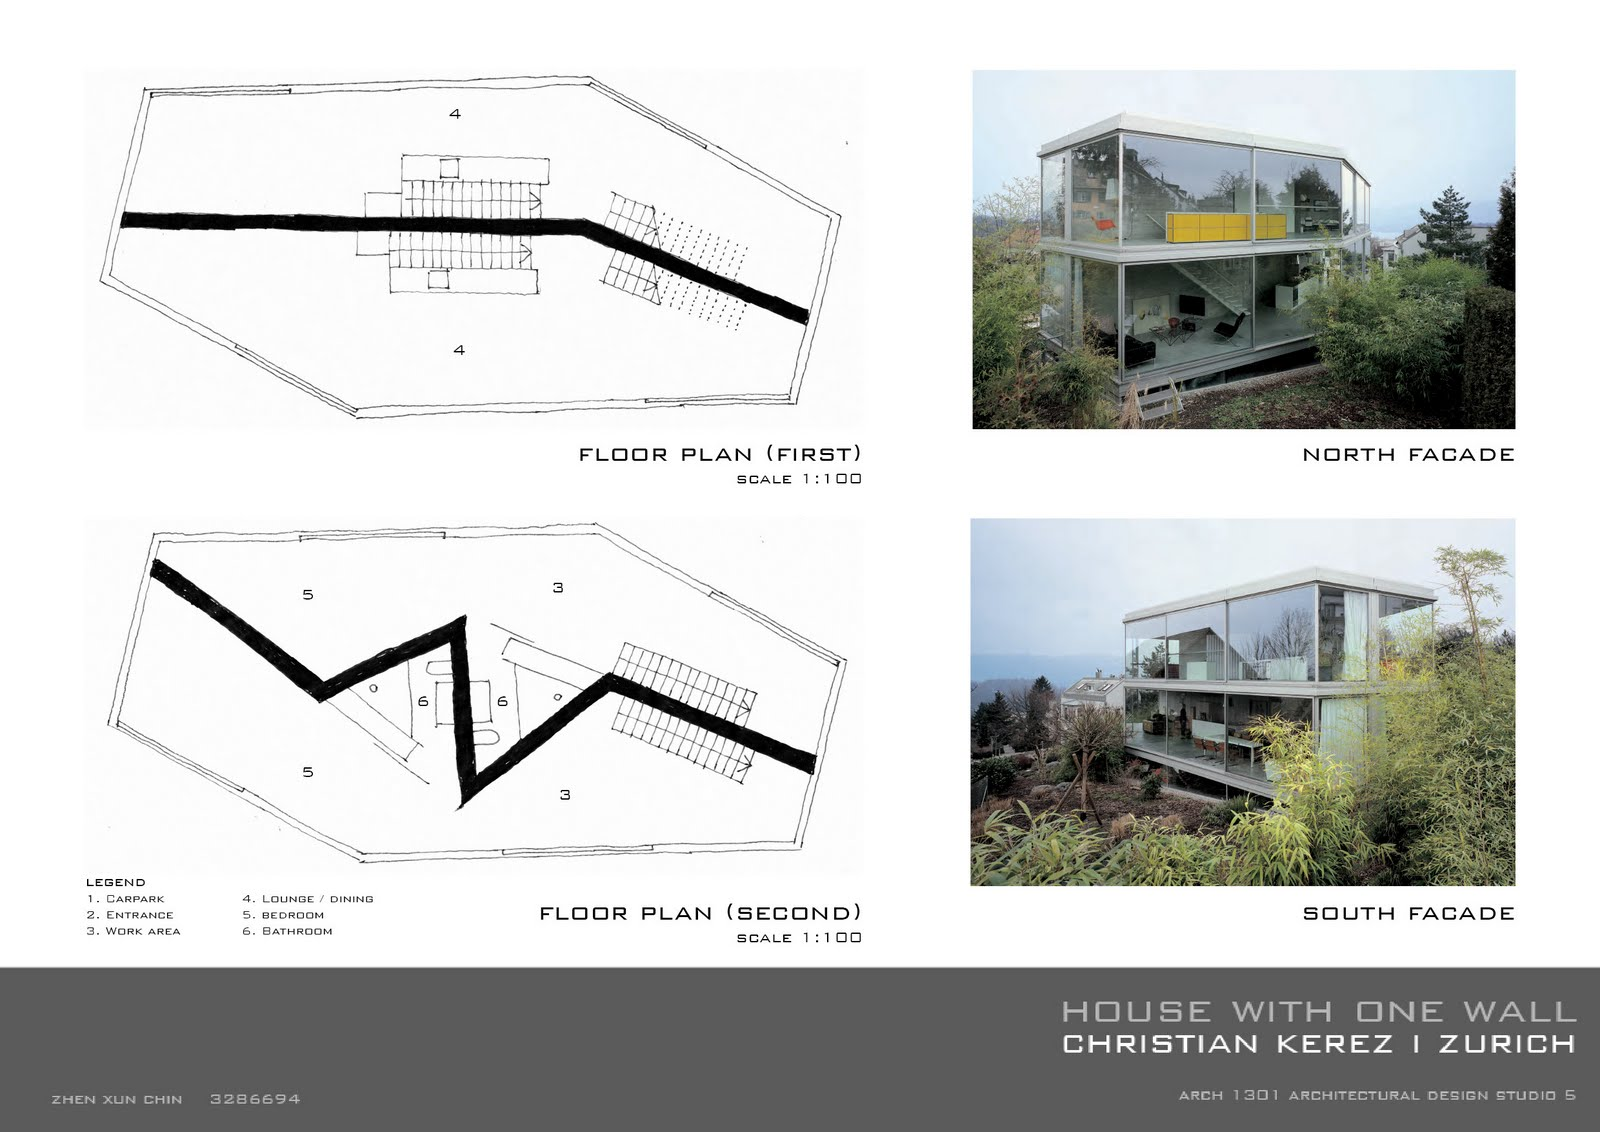 Floor Plan Renderings Zhenxun Chin Week 2 Precedent Study House With One